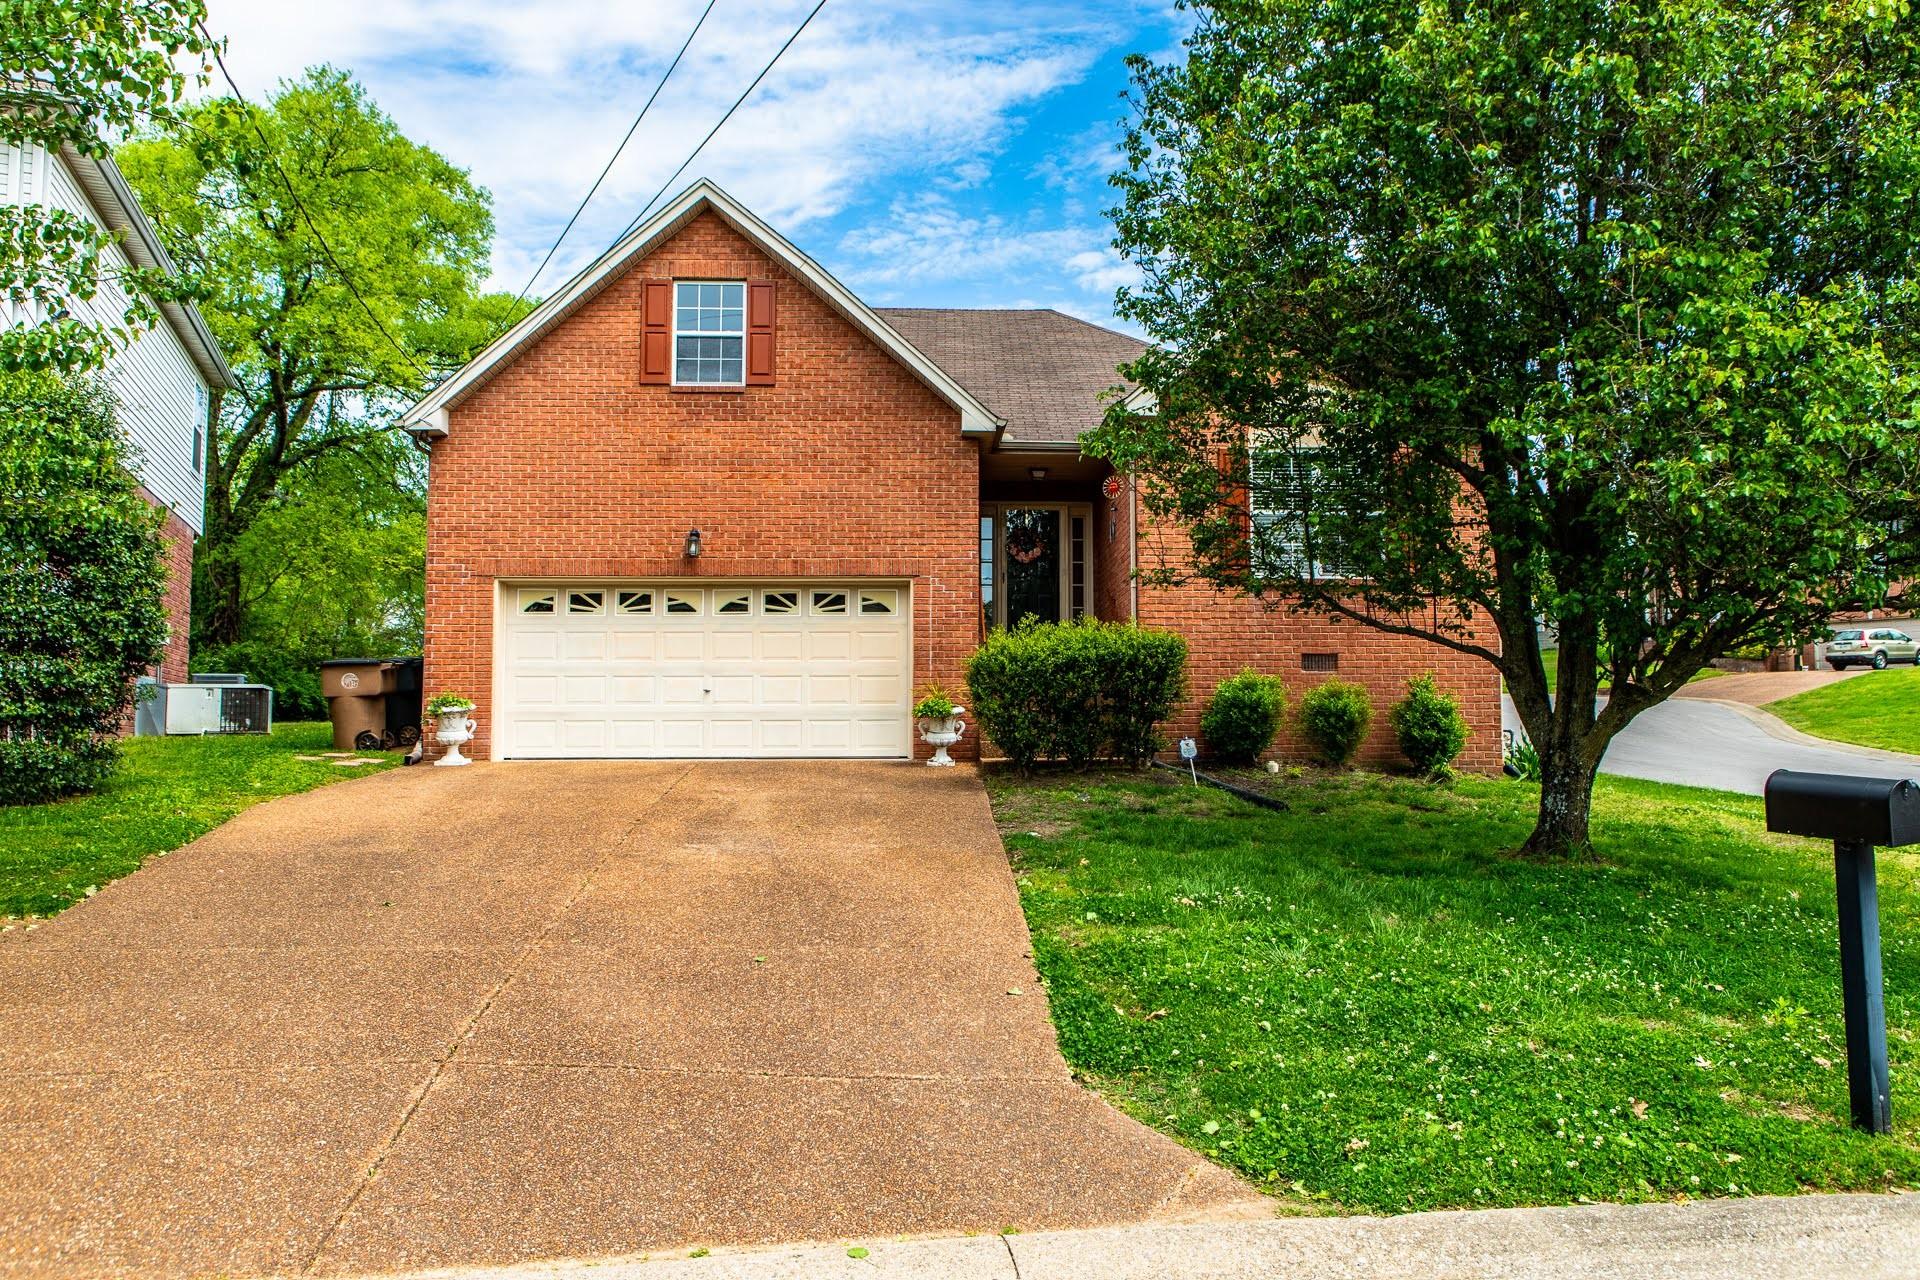 101 Forge Ridge Ct, Nashville, TN 37217 - Nashville, TN real estate listing